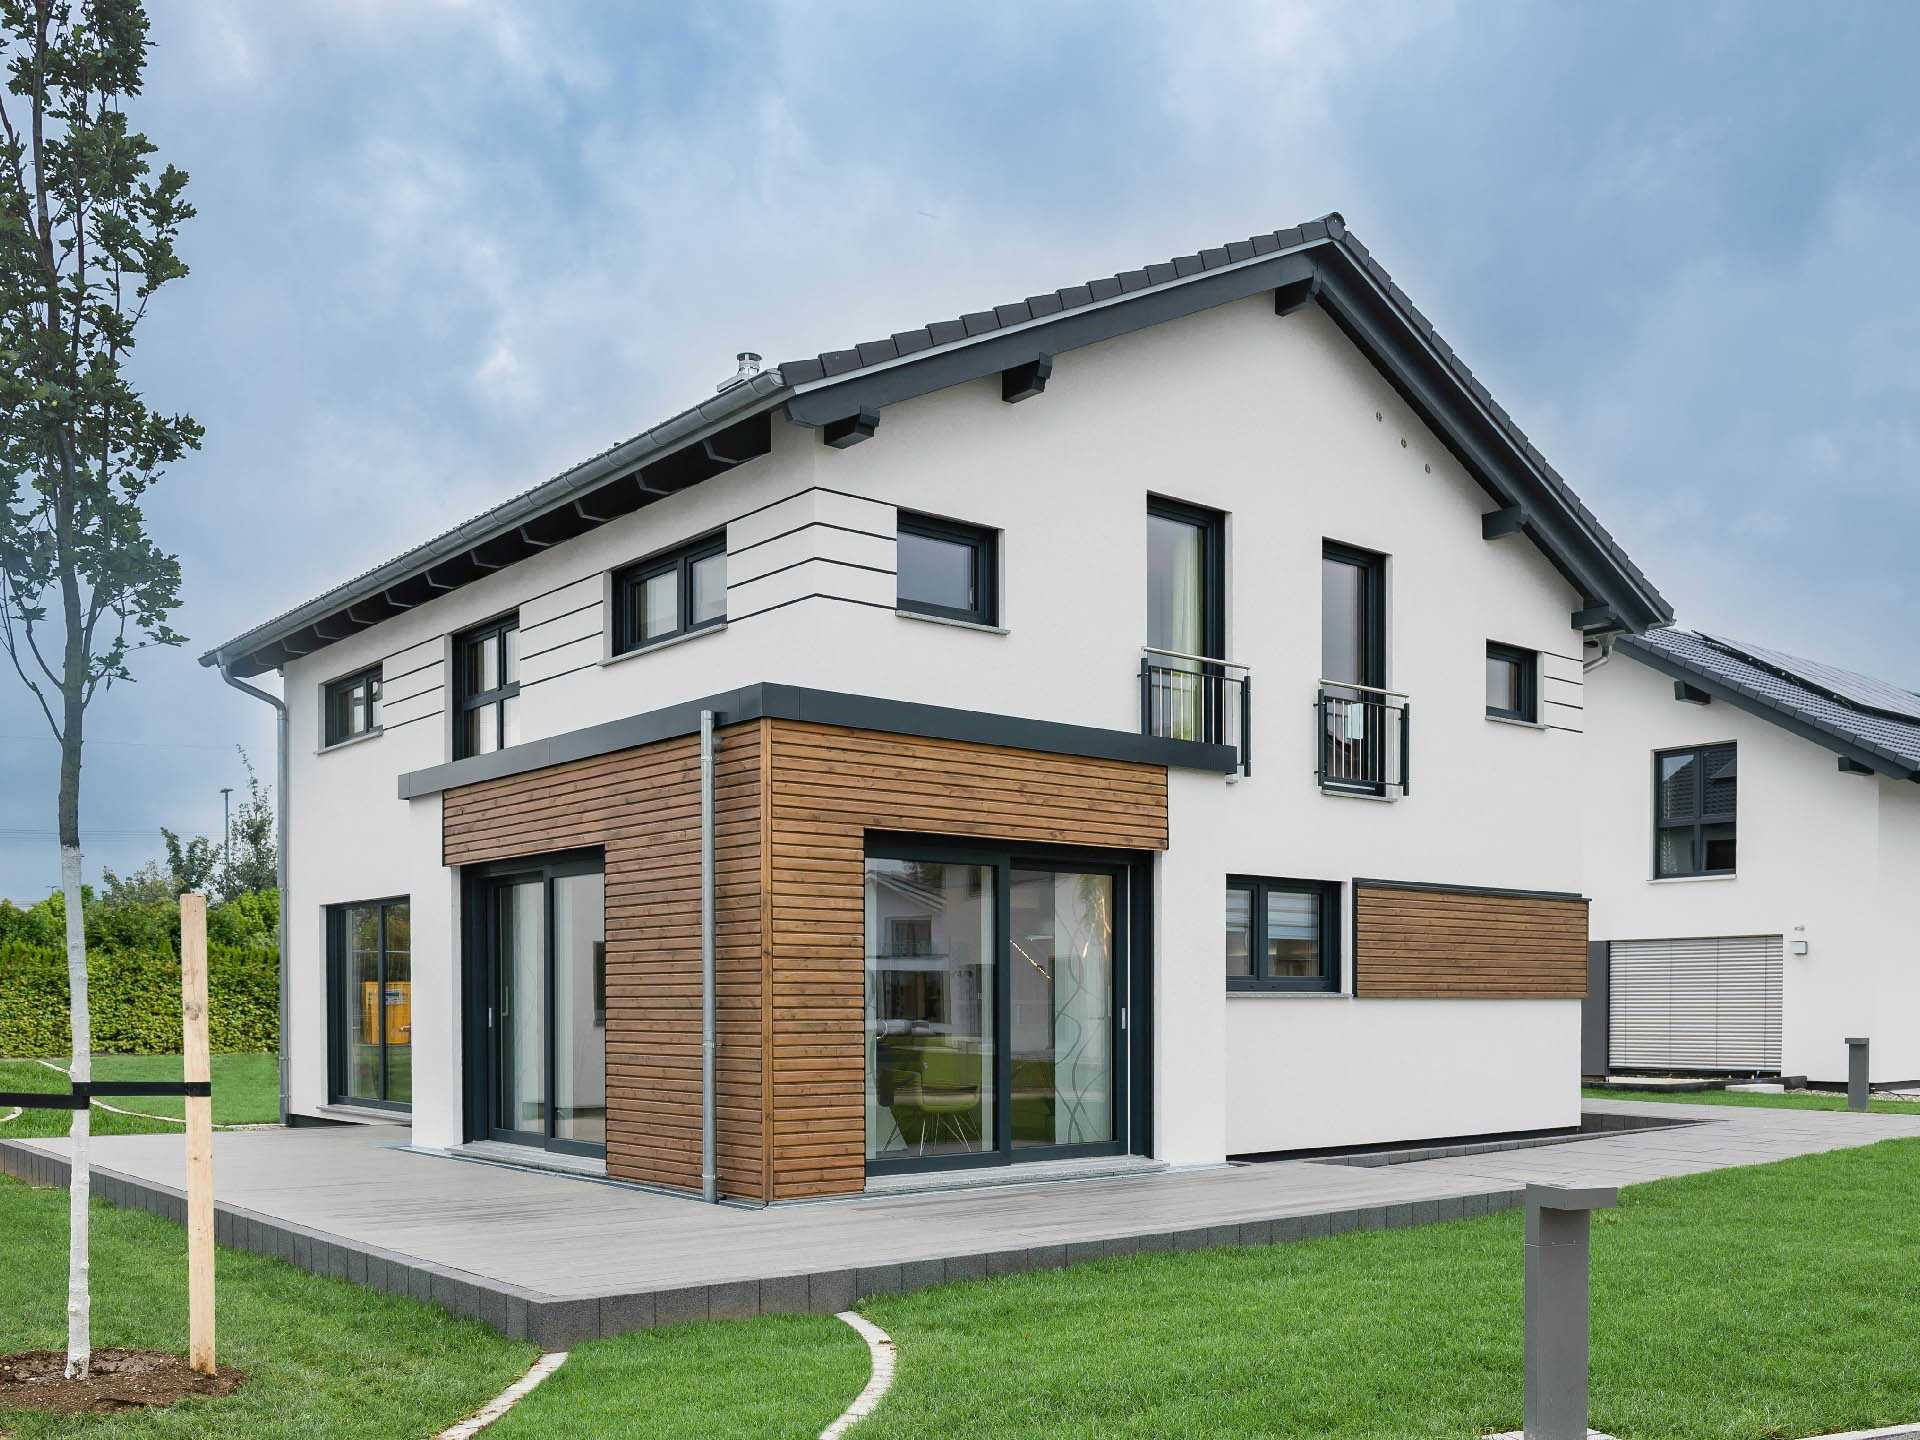 musterhaus modena rensch haus. Black Bedroom Furniture Sets. Home Design Ideas